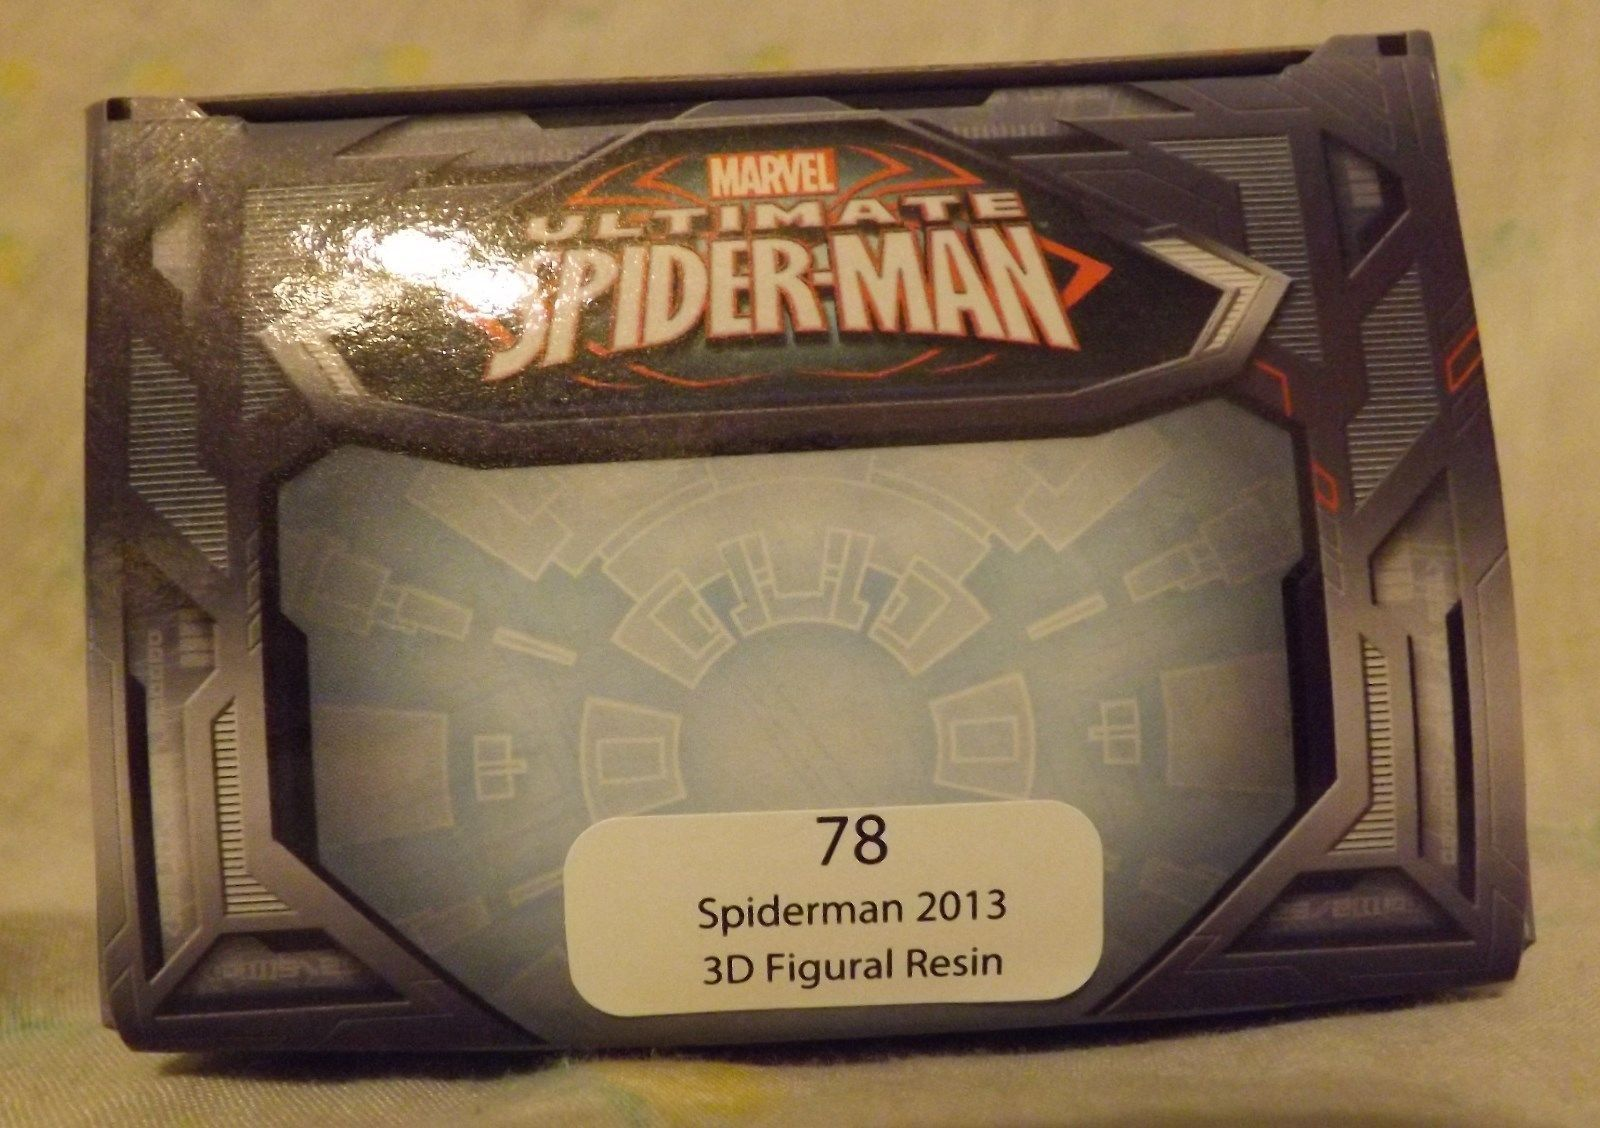 Marvel Ultimate Spiderman 3D Figural Resin Ornament 2013 image 2